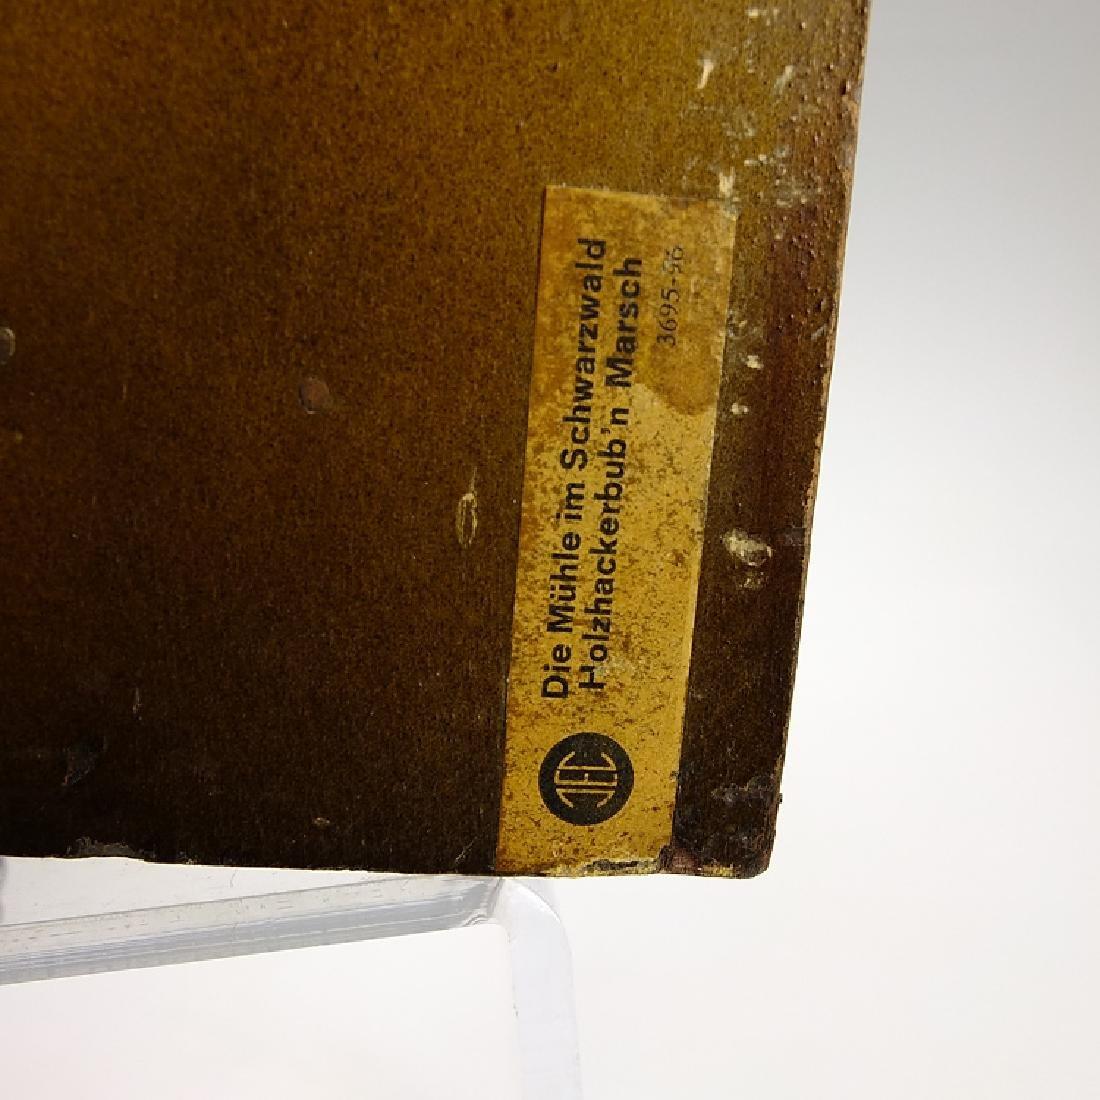 Black Forest Clock VINTAGE CUCKOO CLOCK MUSIC BOX WATER - 8